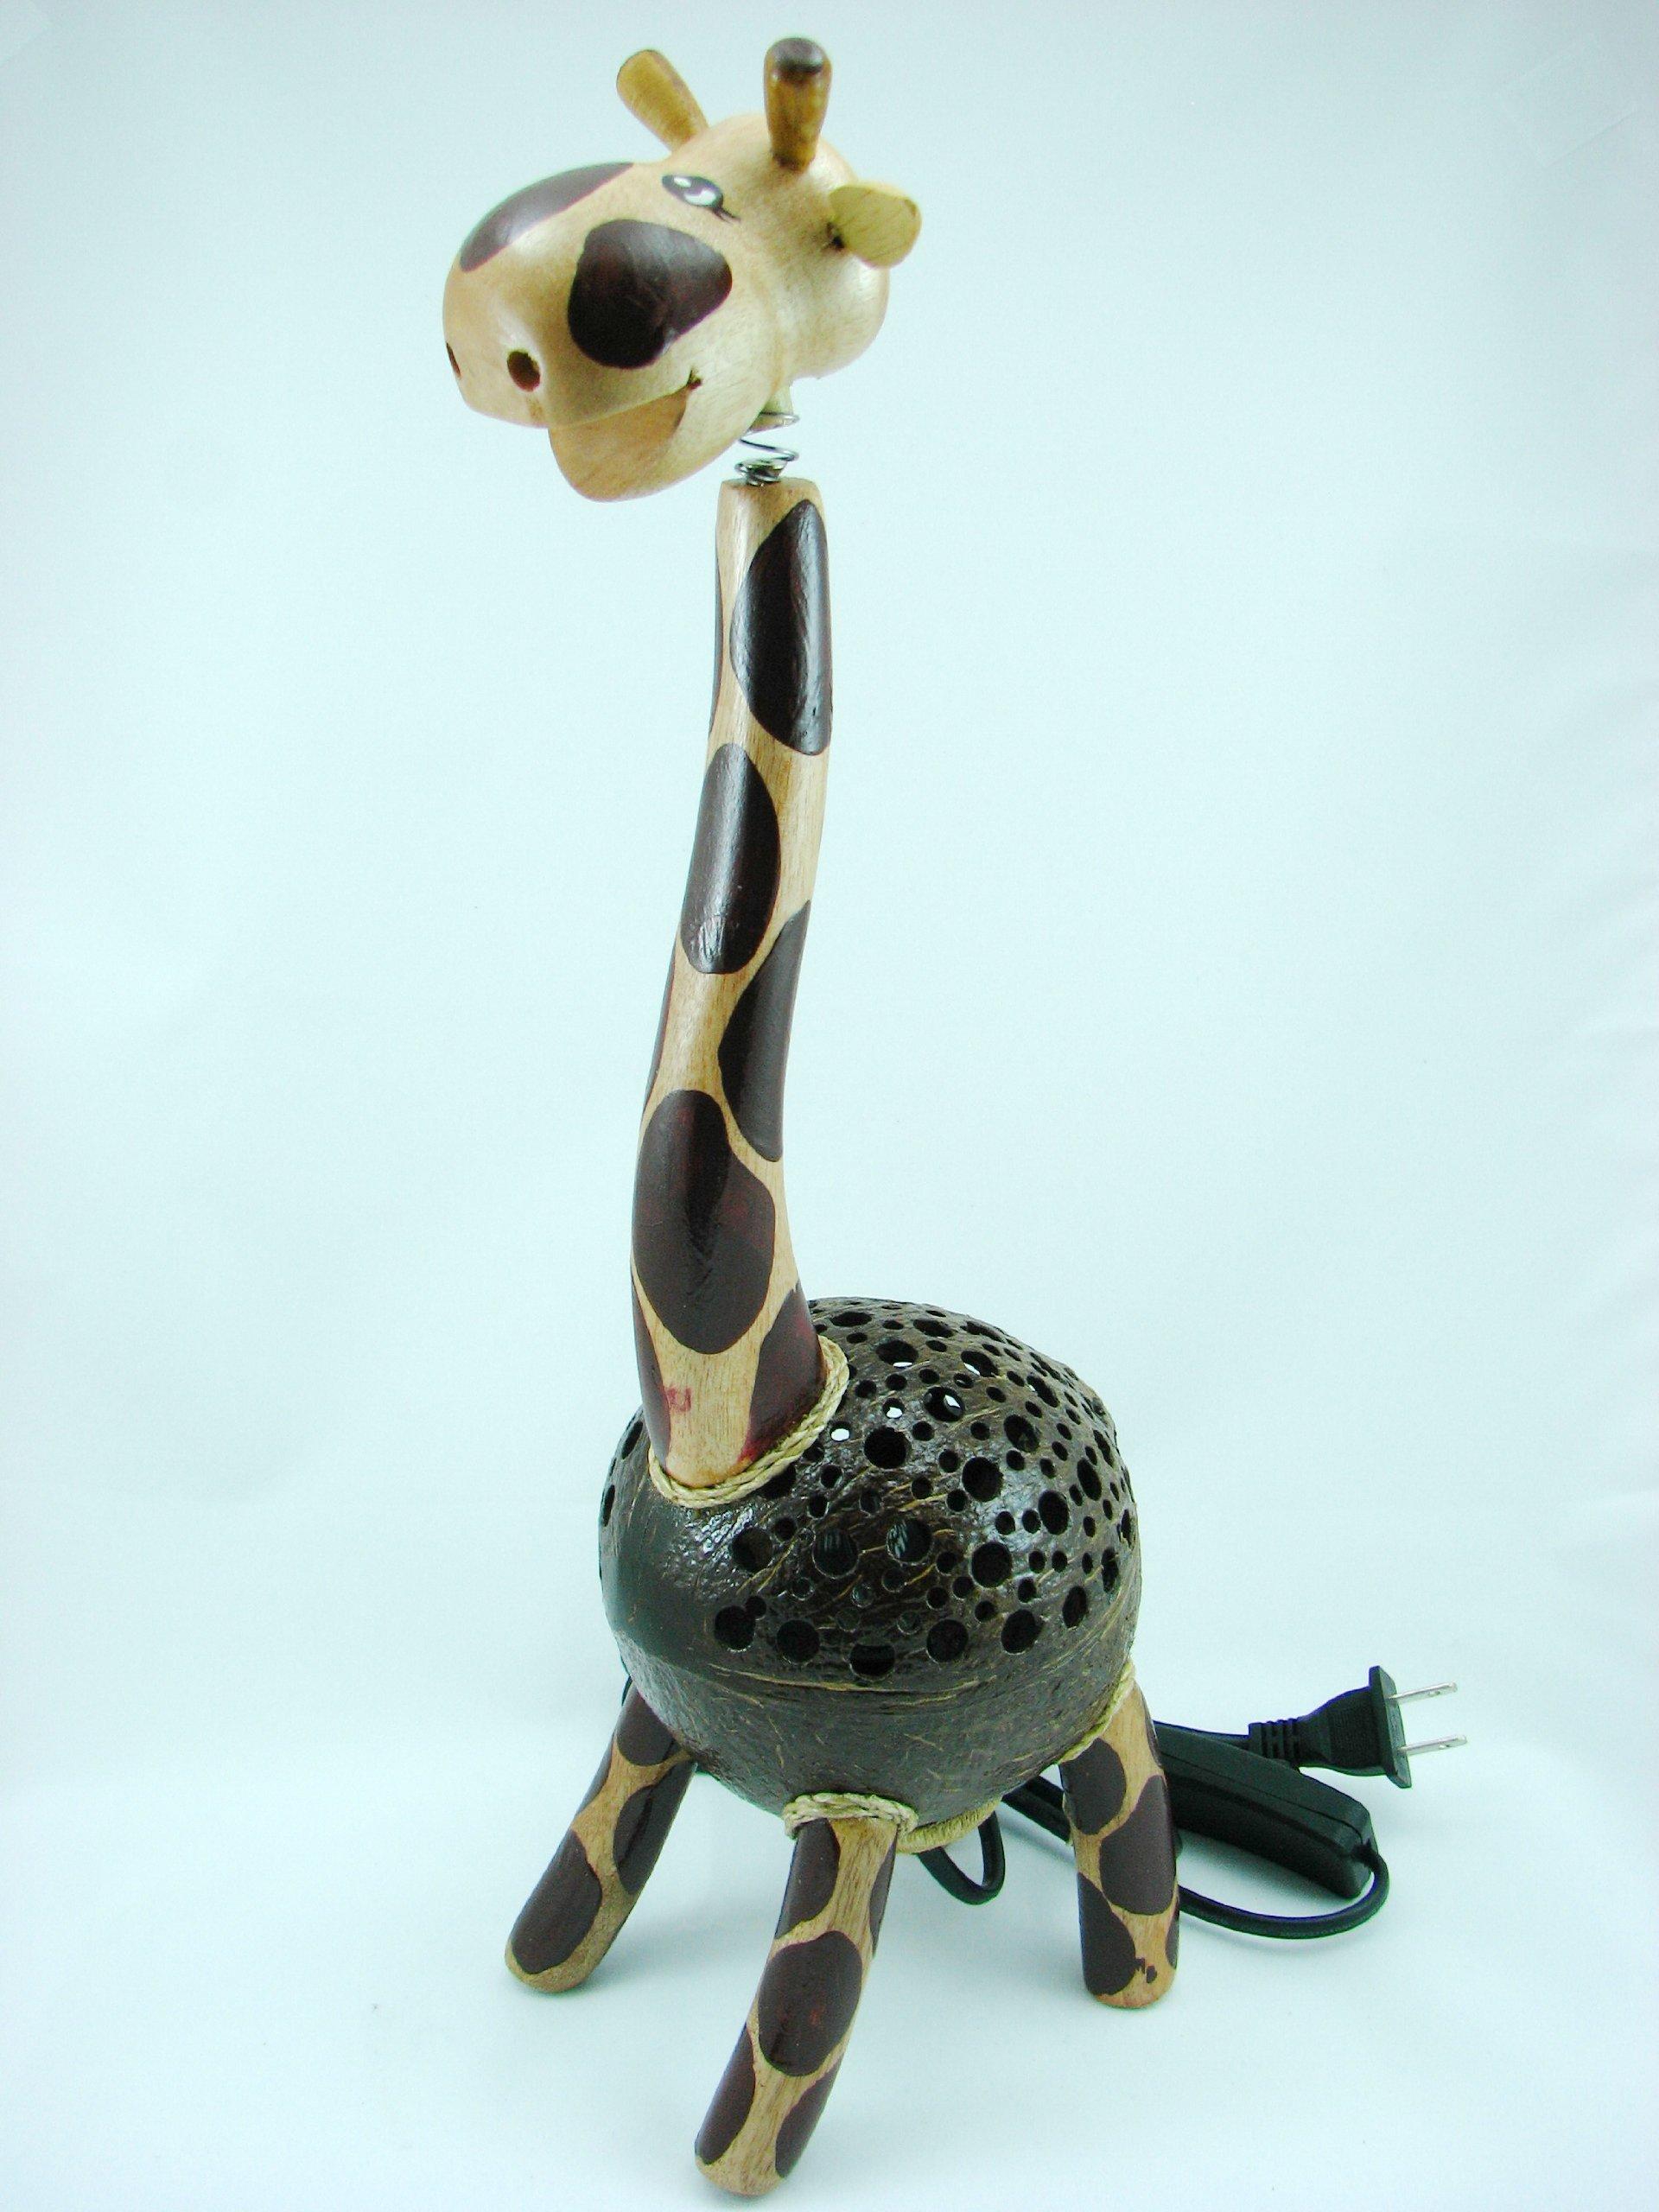 Coconut Shell Lamp - Giraffe Lamp 12'' Height - Wooden Crafts Handmade of Thailand Craftsman